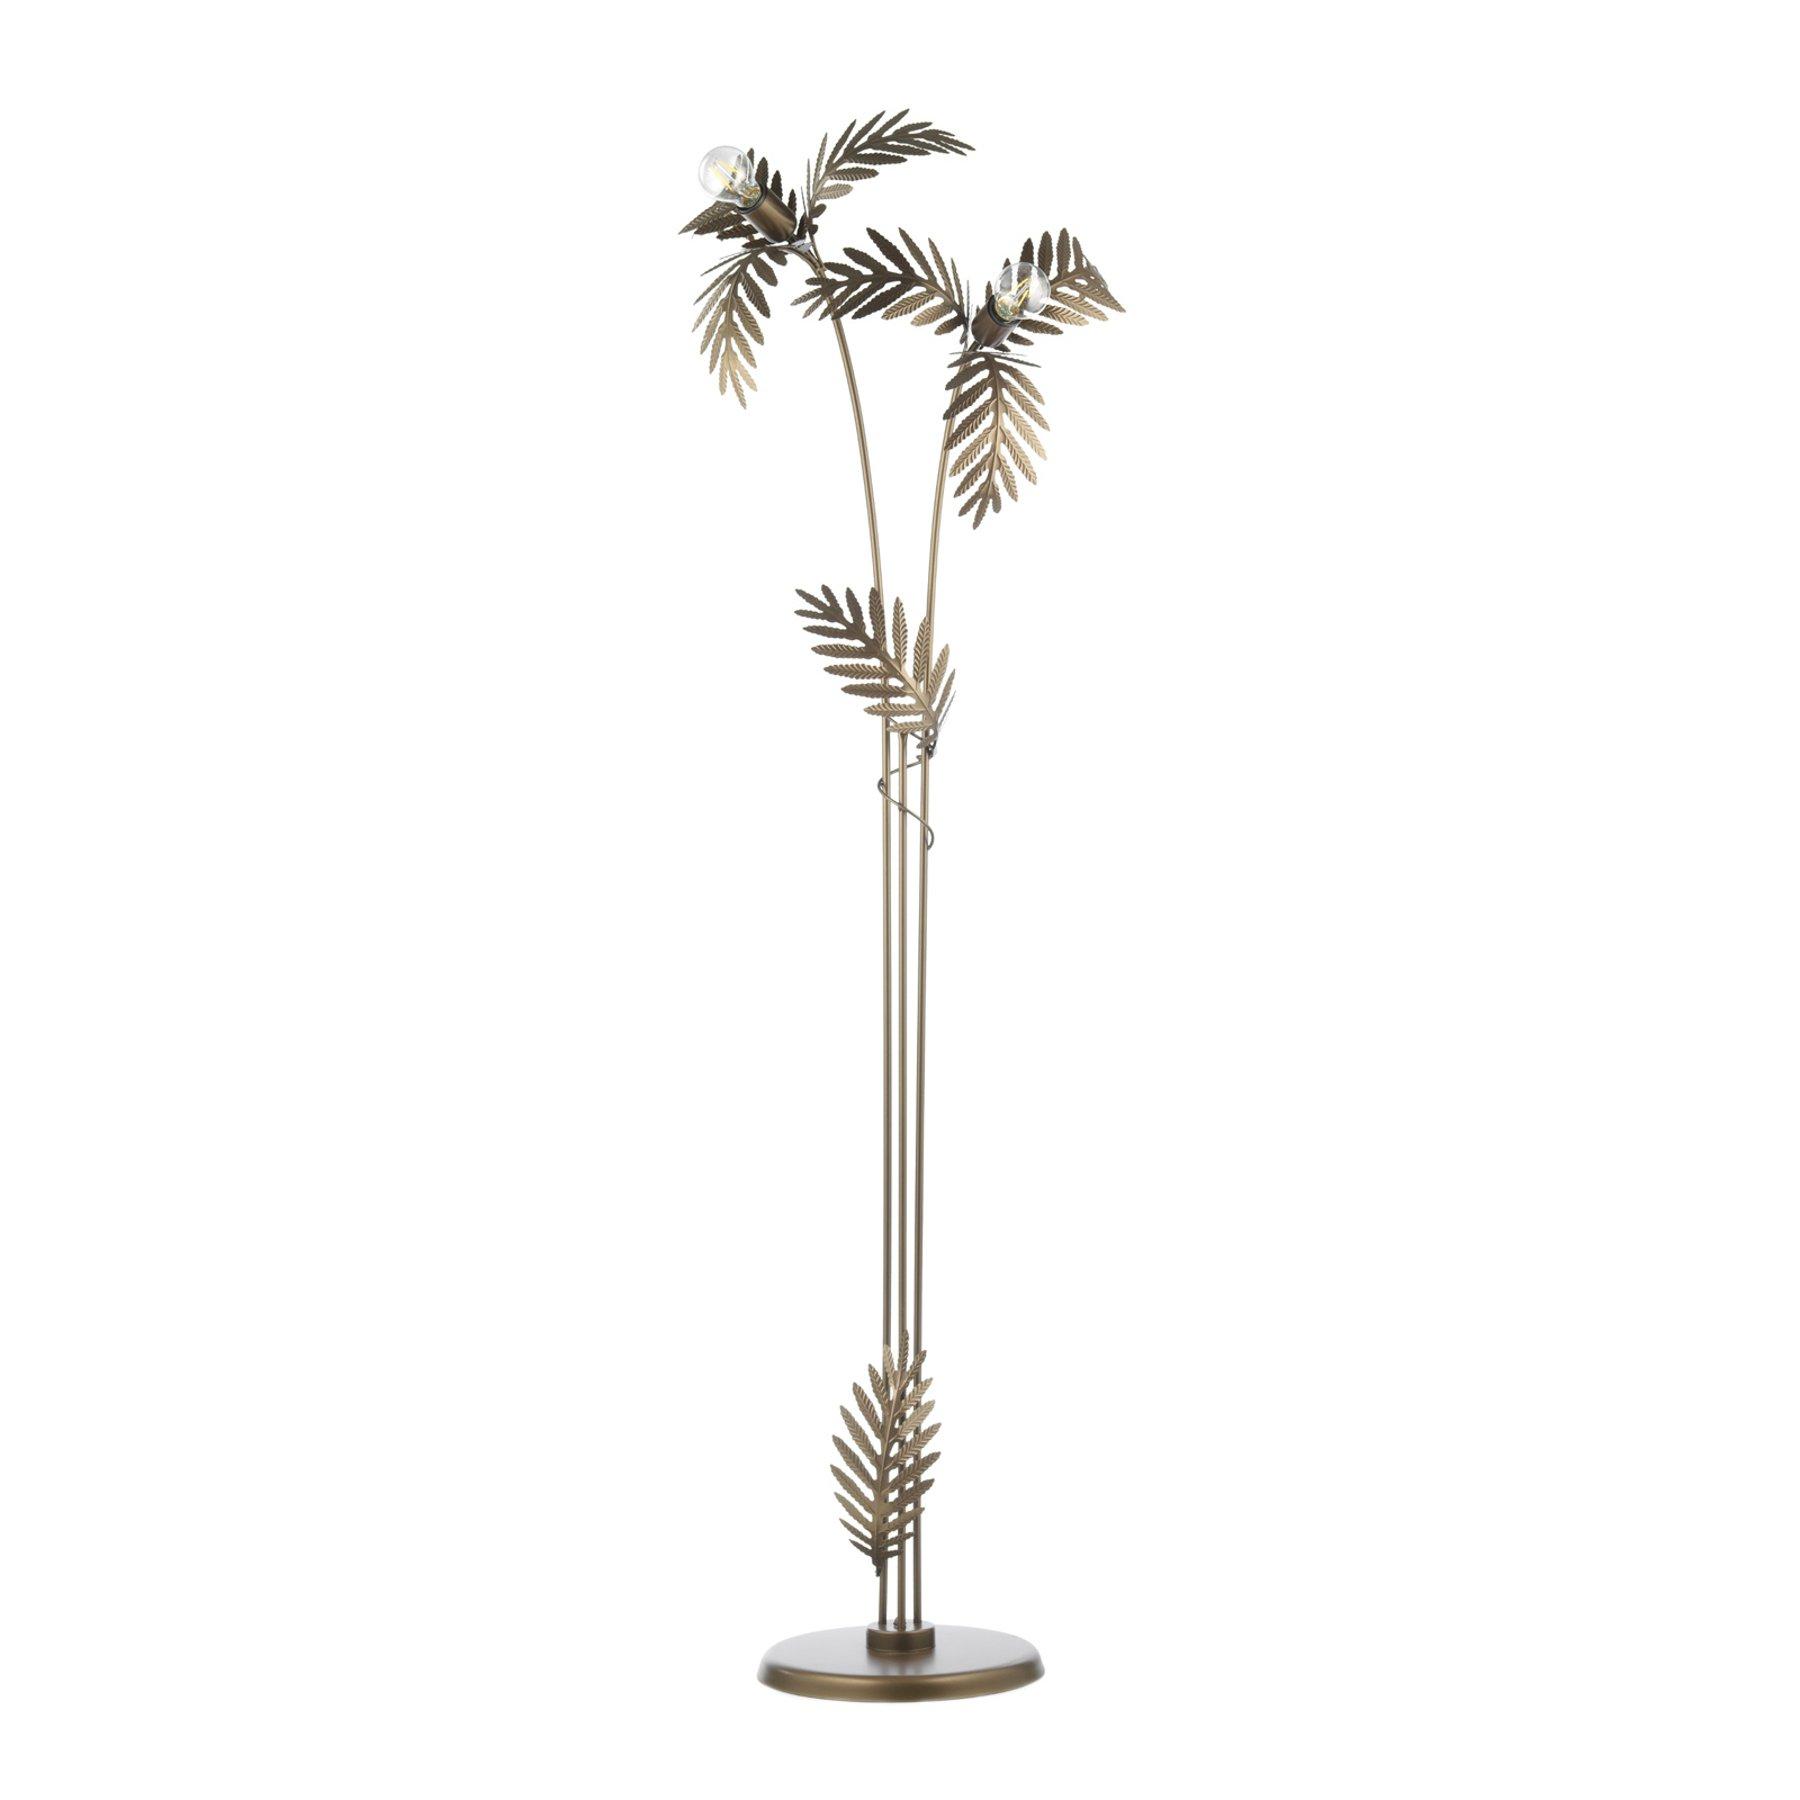 Gulvlampe Dubai i bladstil, bronse